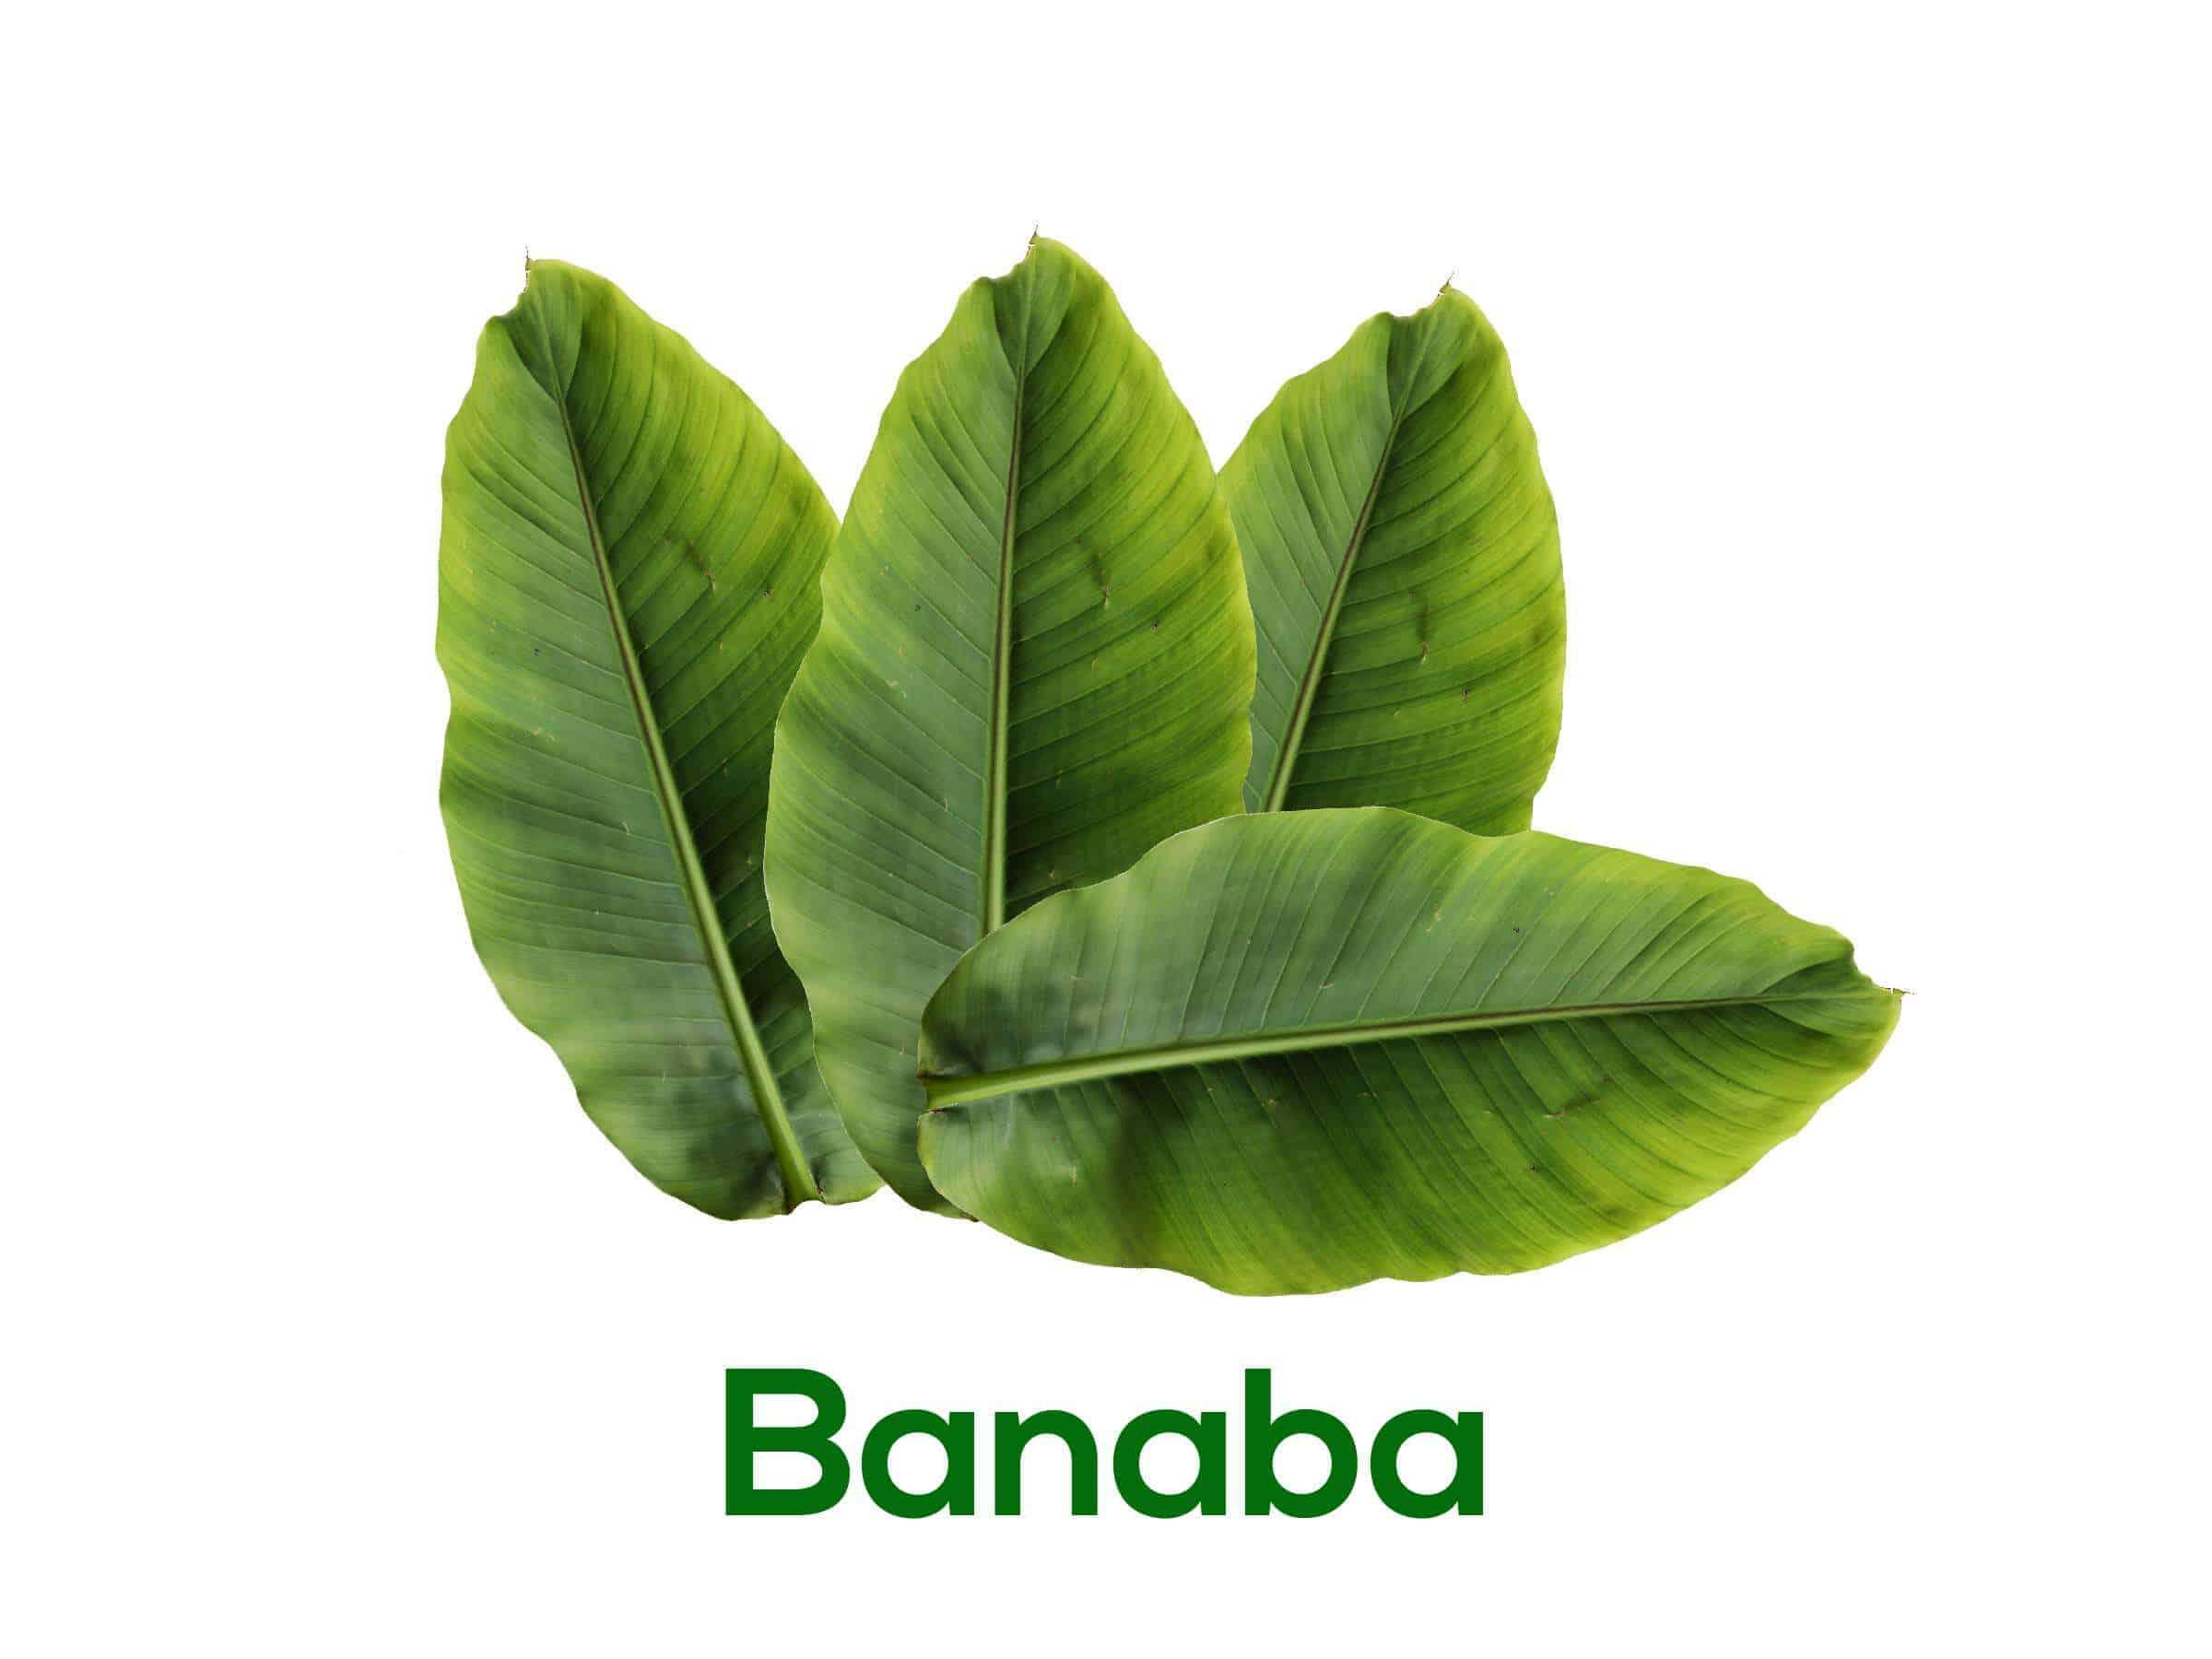 Banaba leaf benefits